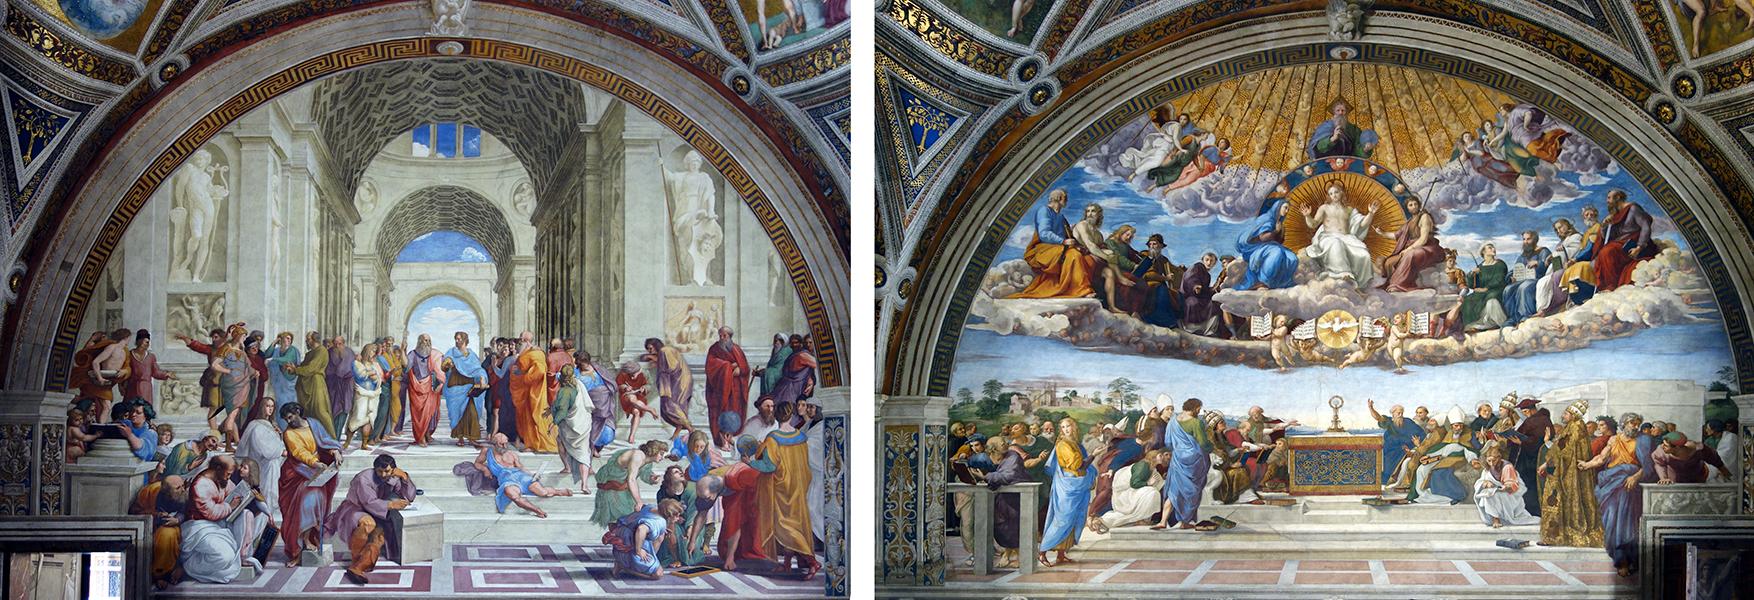 Raphael, School of Athens (left) and Disputà (right), fresco, 1509-1511 (Stanza della Segnatura, Papal Palace, Vatican)